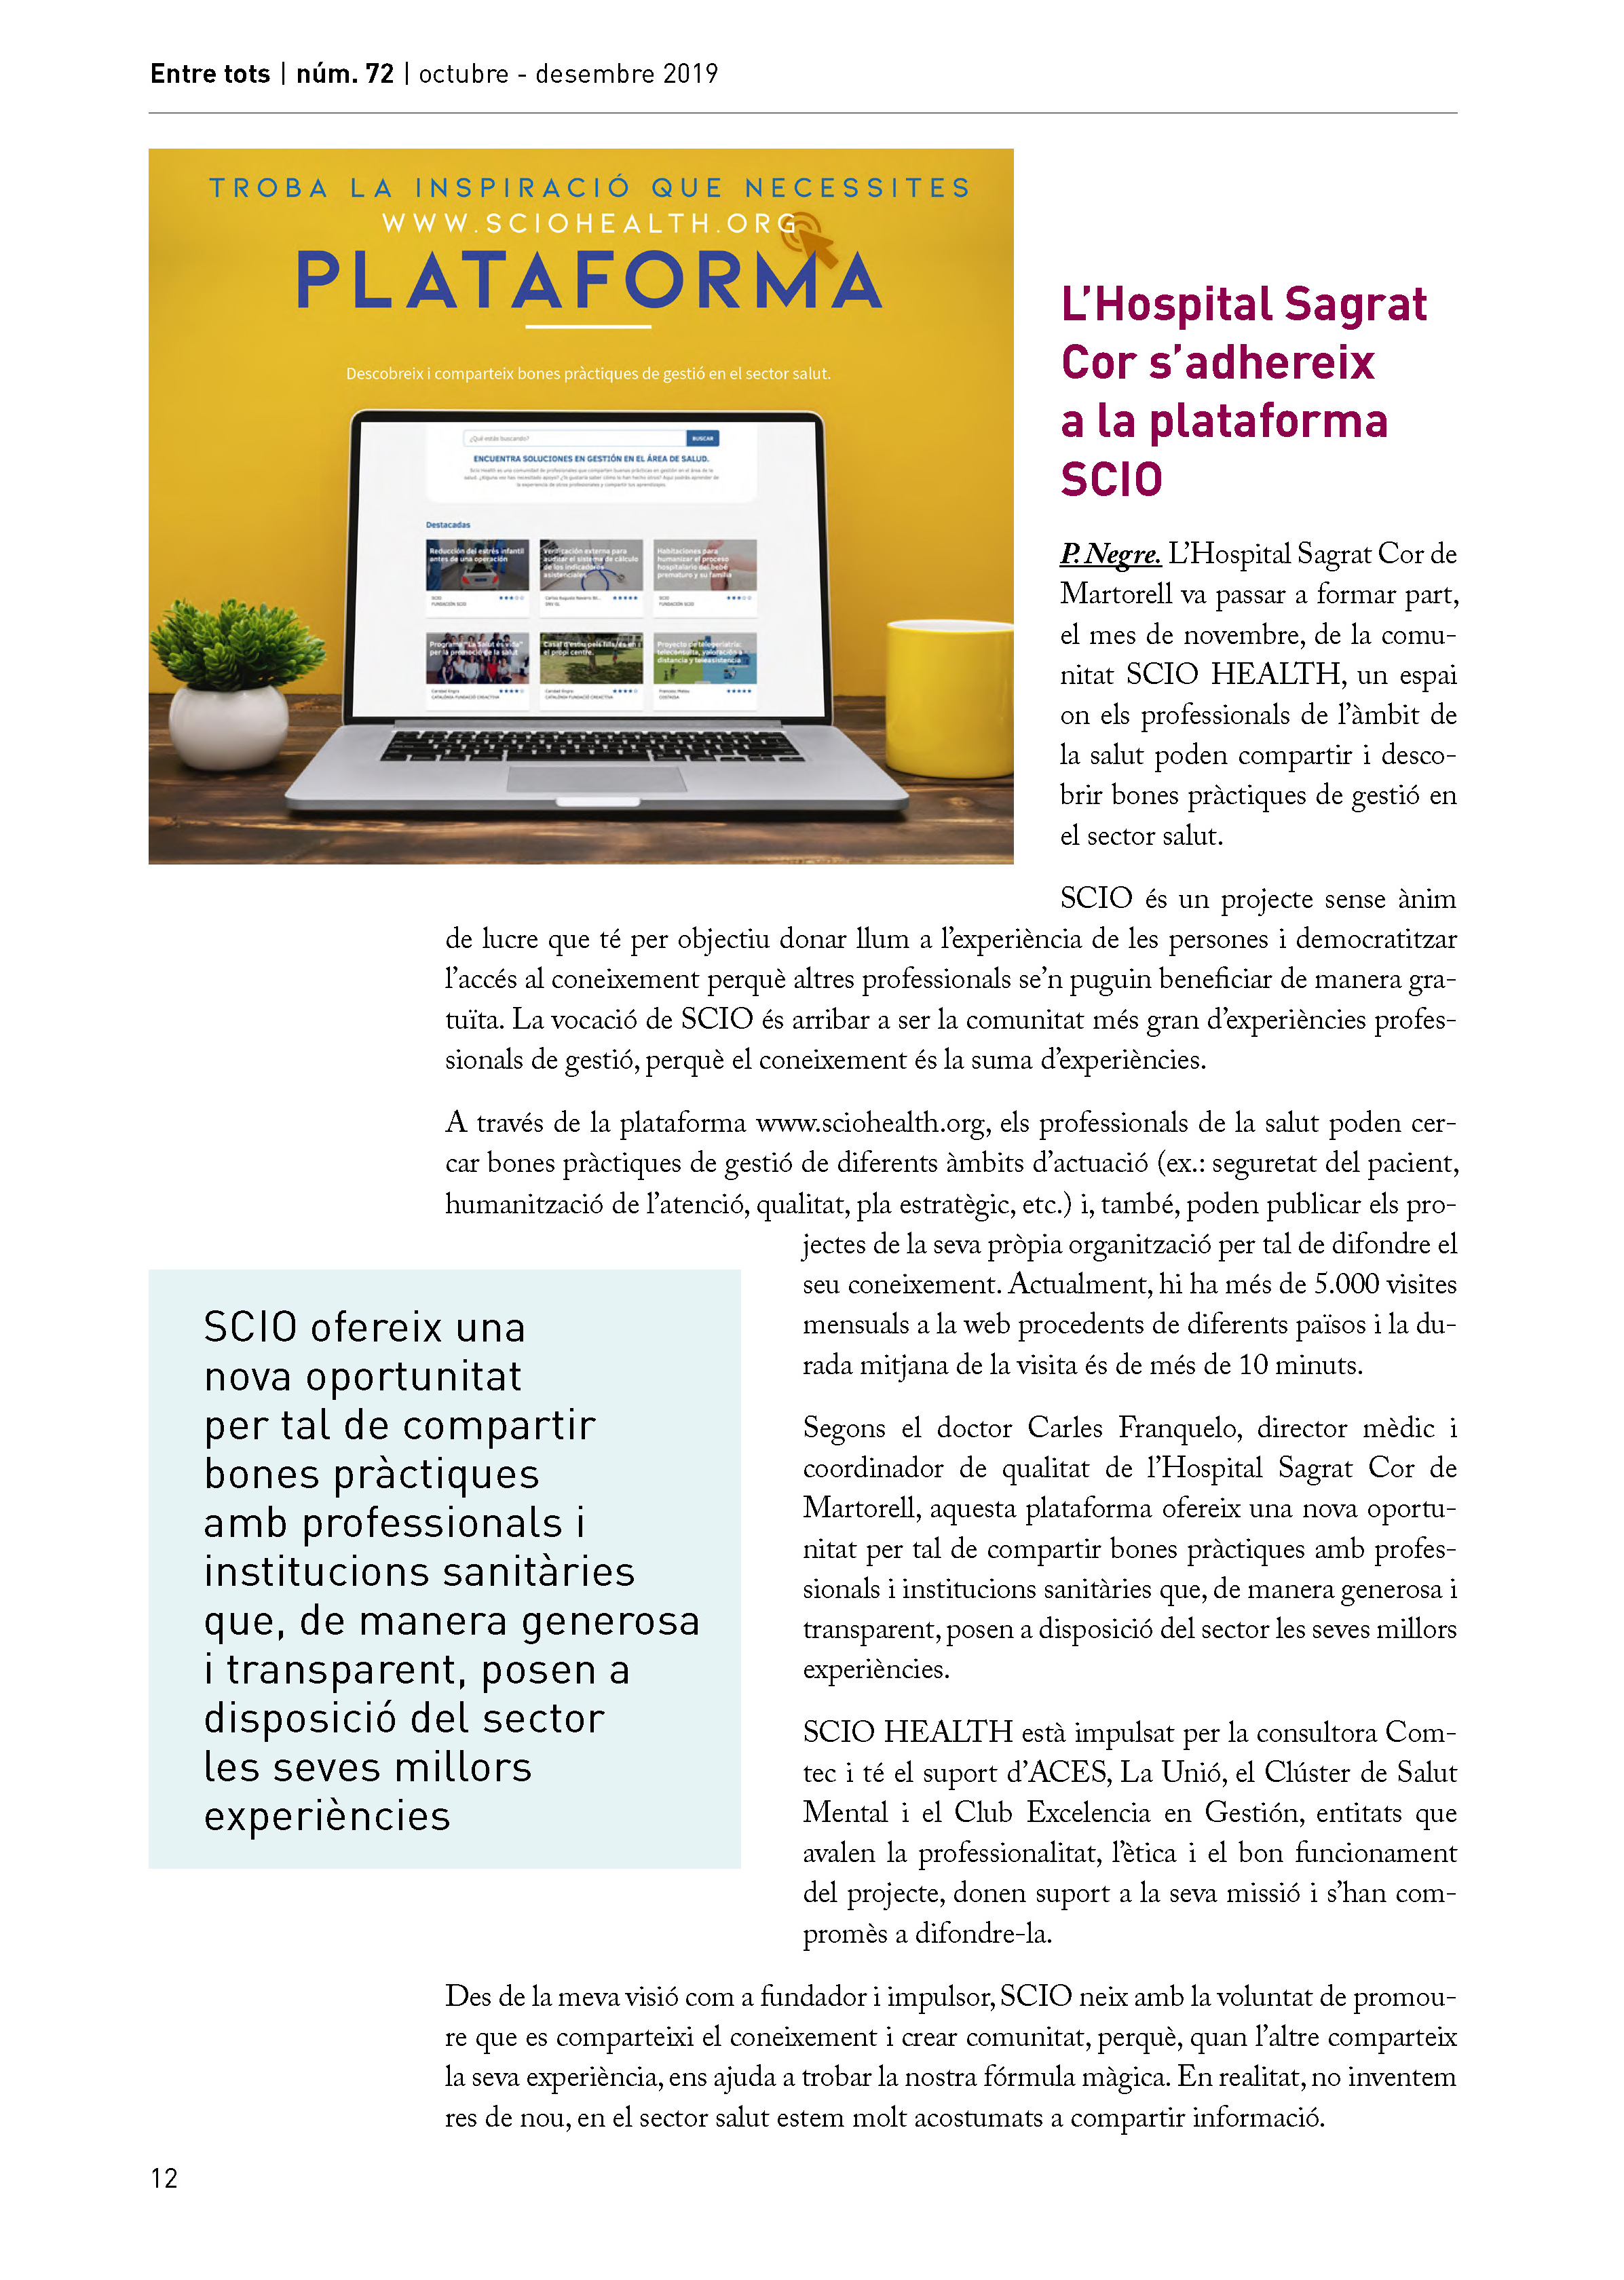 Revista_Entre tots_oct-des 2019_SCIO